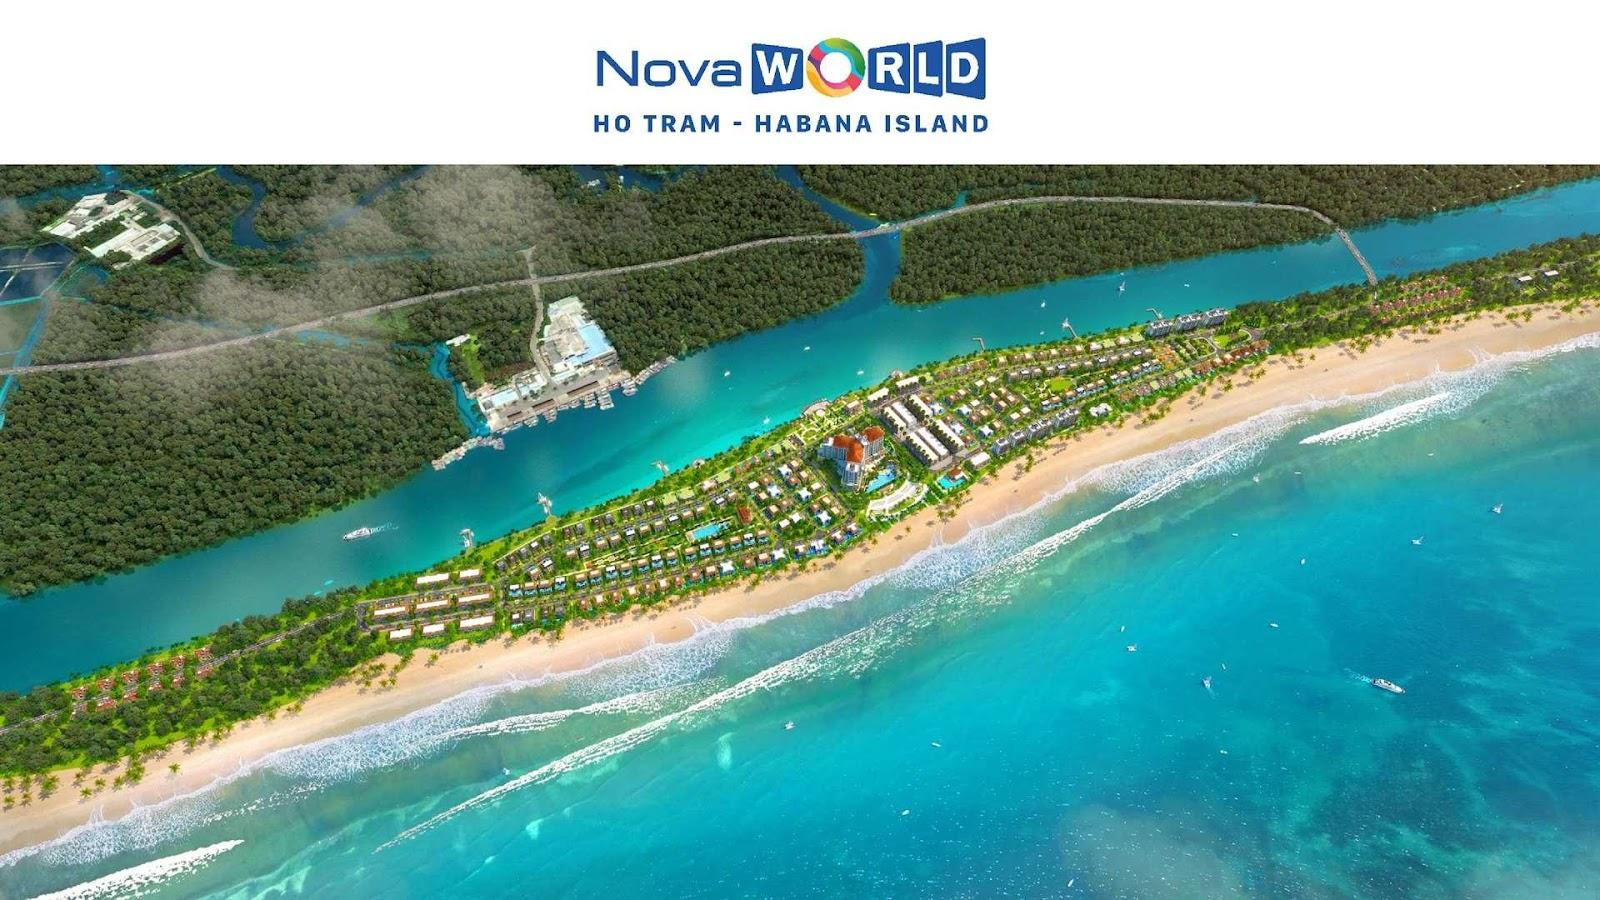 C:\Users\hp\Desktop\toan-canh-Habana-island-NovaWorld-Ho-Tram-novaland-dao-2-mat-tien.jpeg